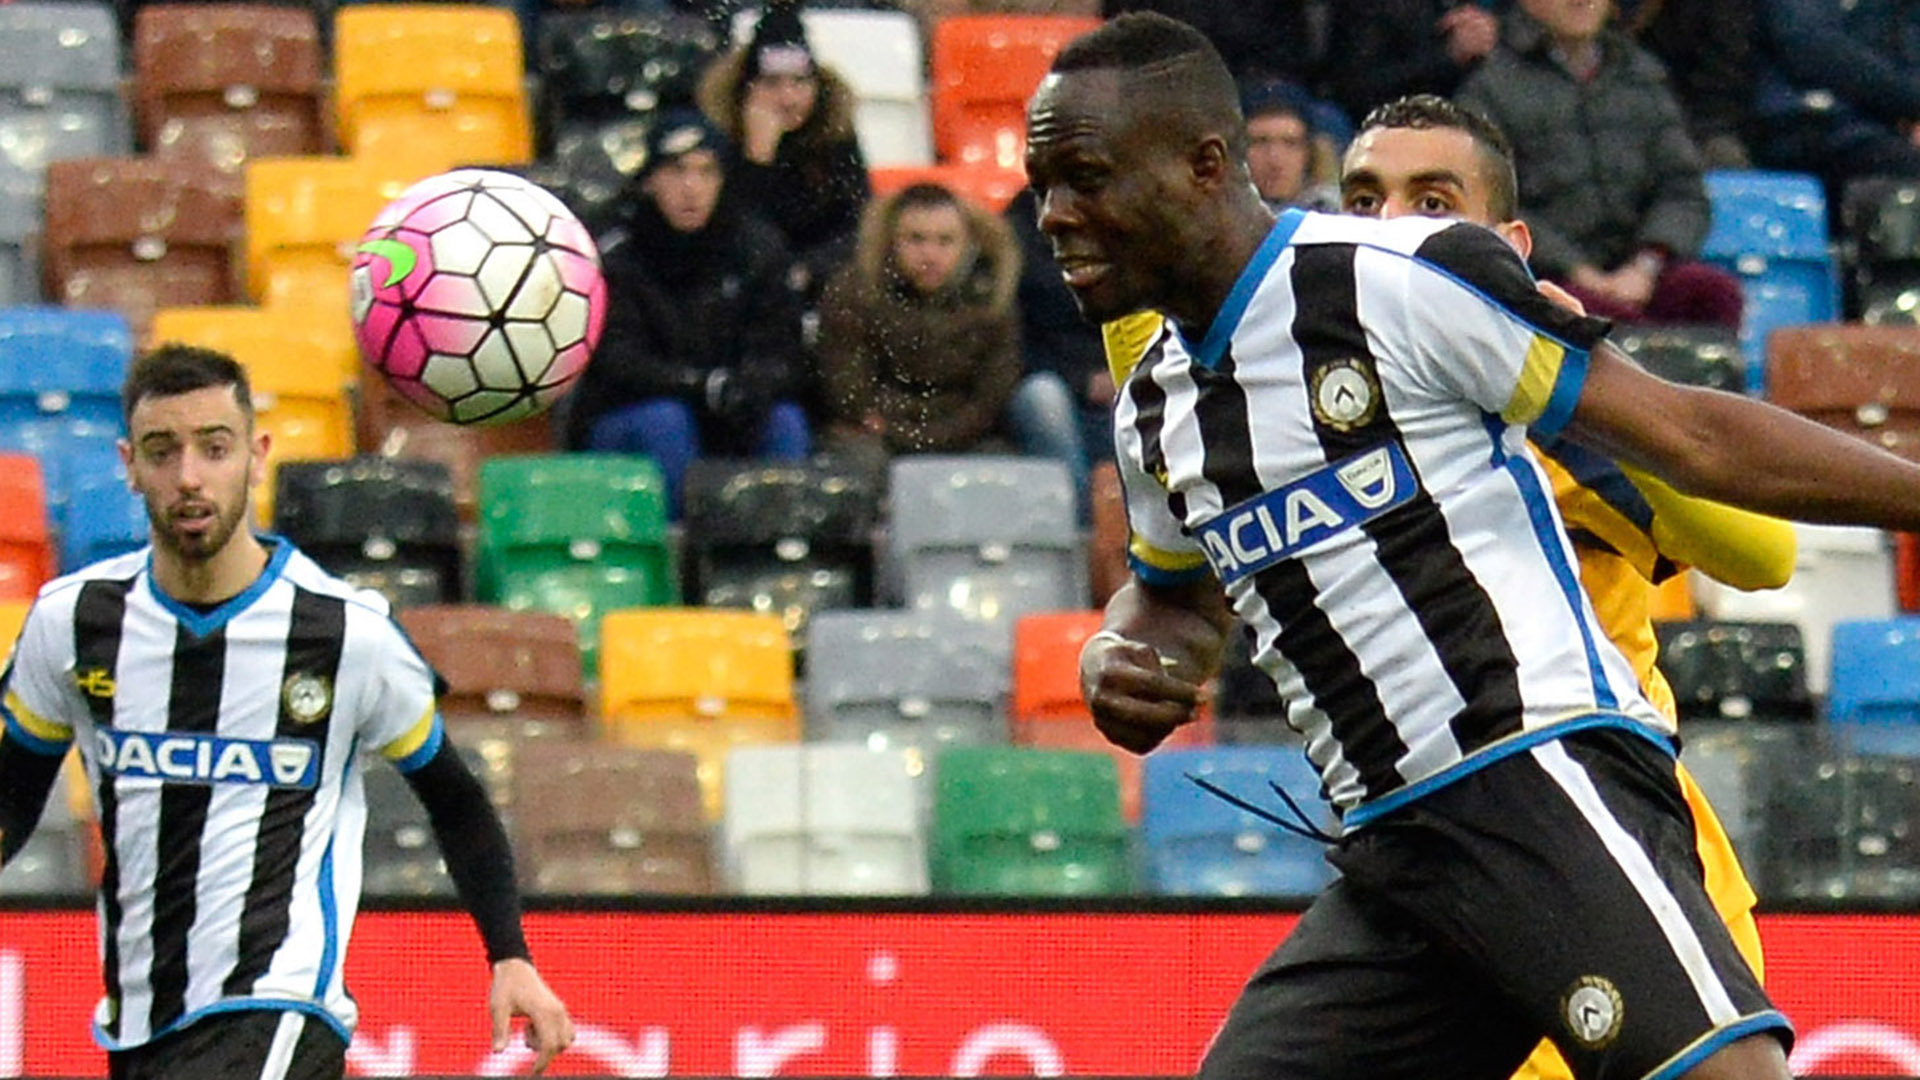 Video: Chievo vs Genoa